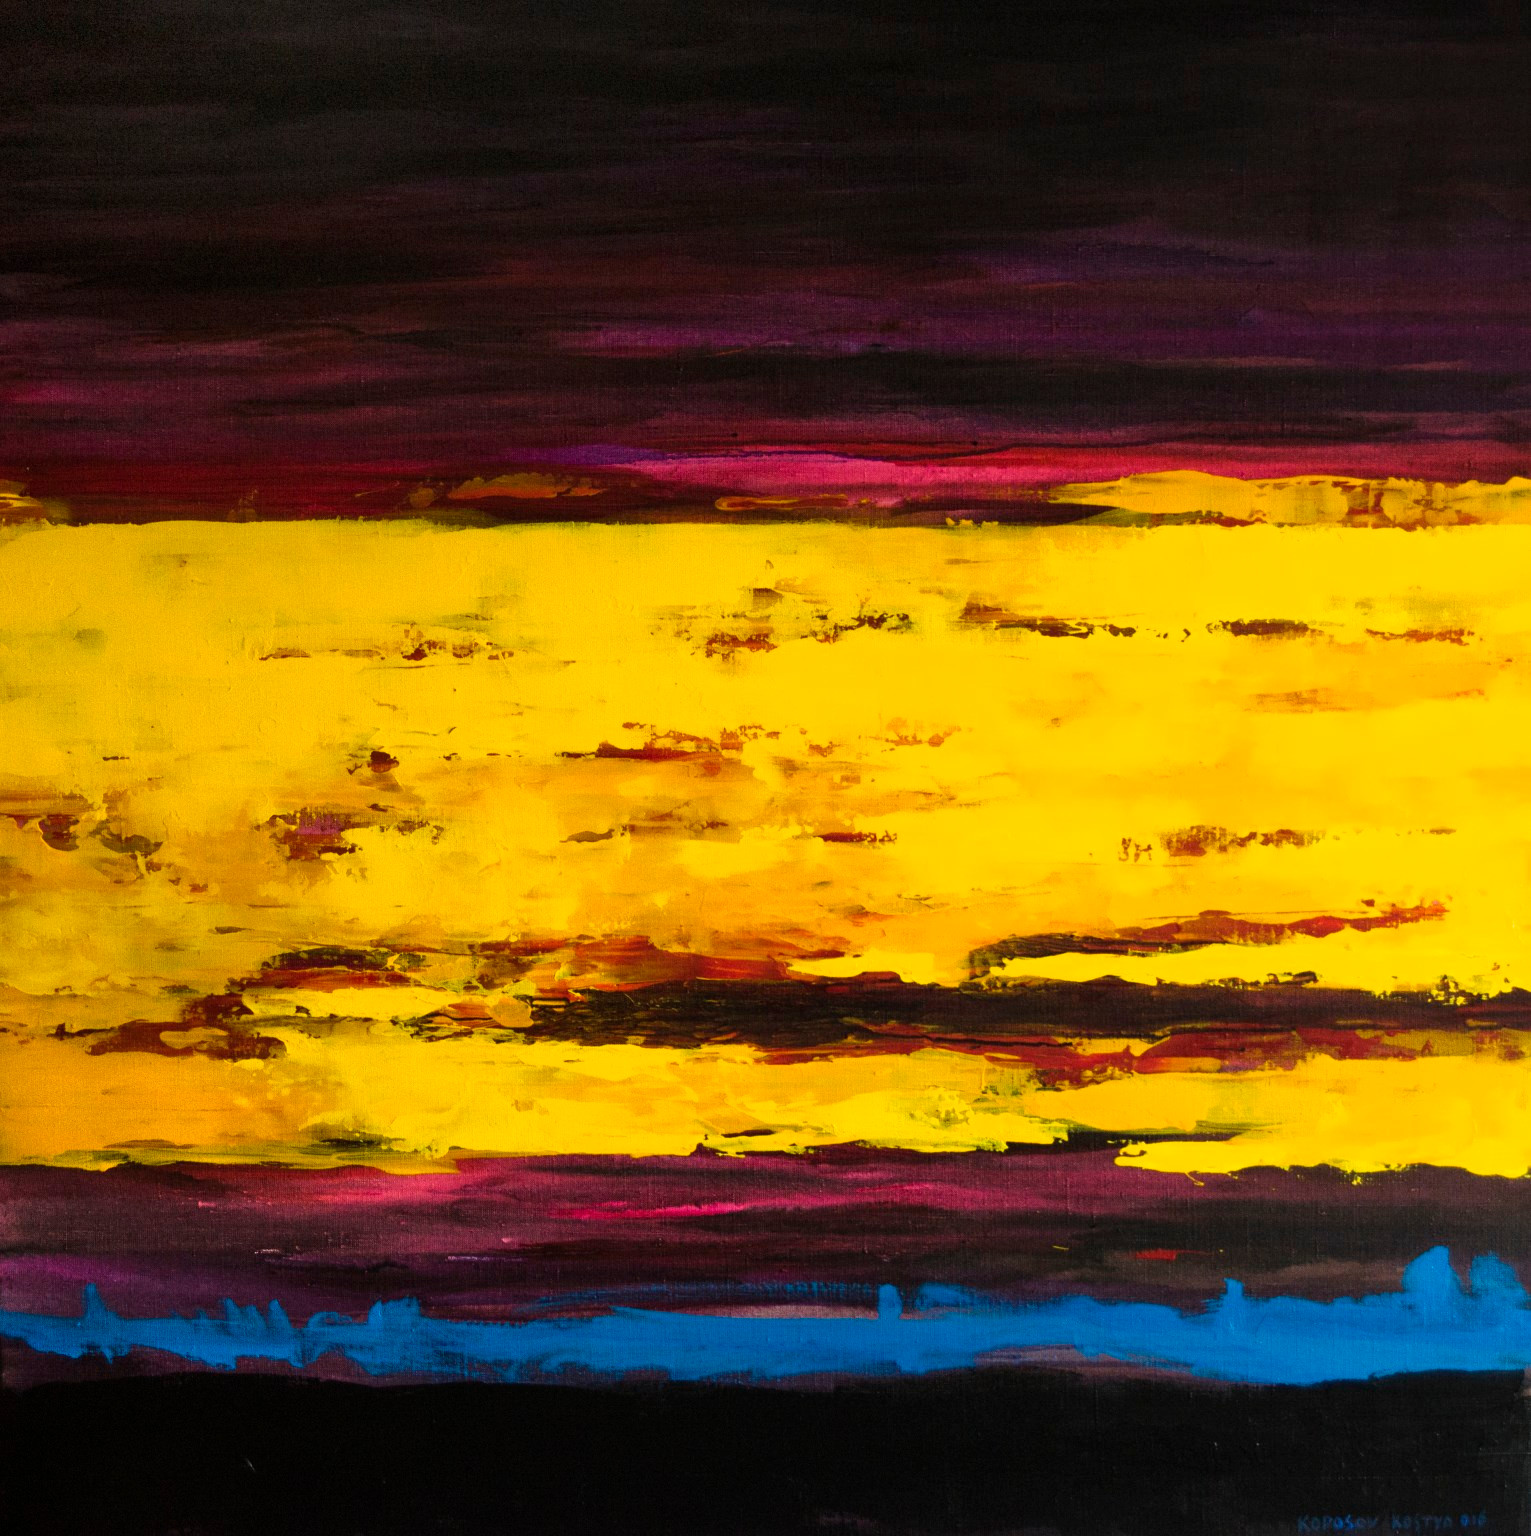 Жовта хмара, полотно, акрил, 115х115 см,